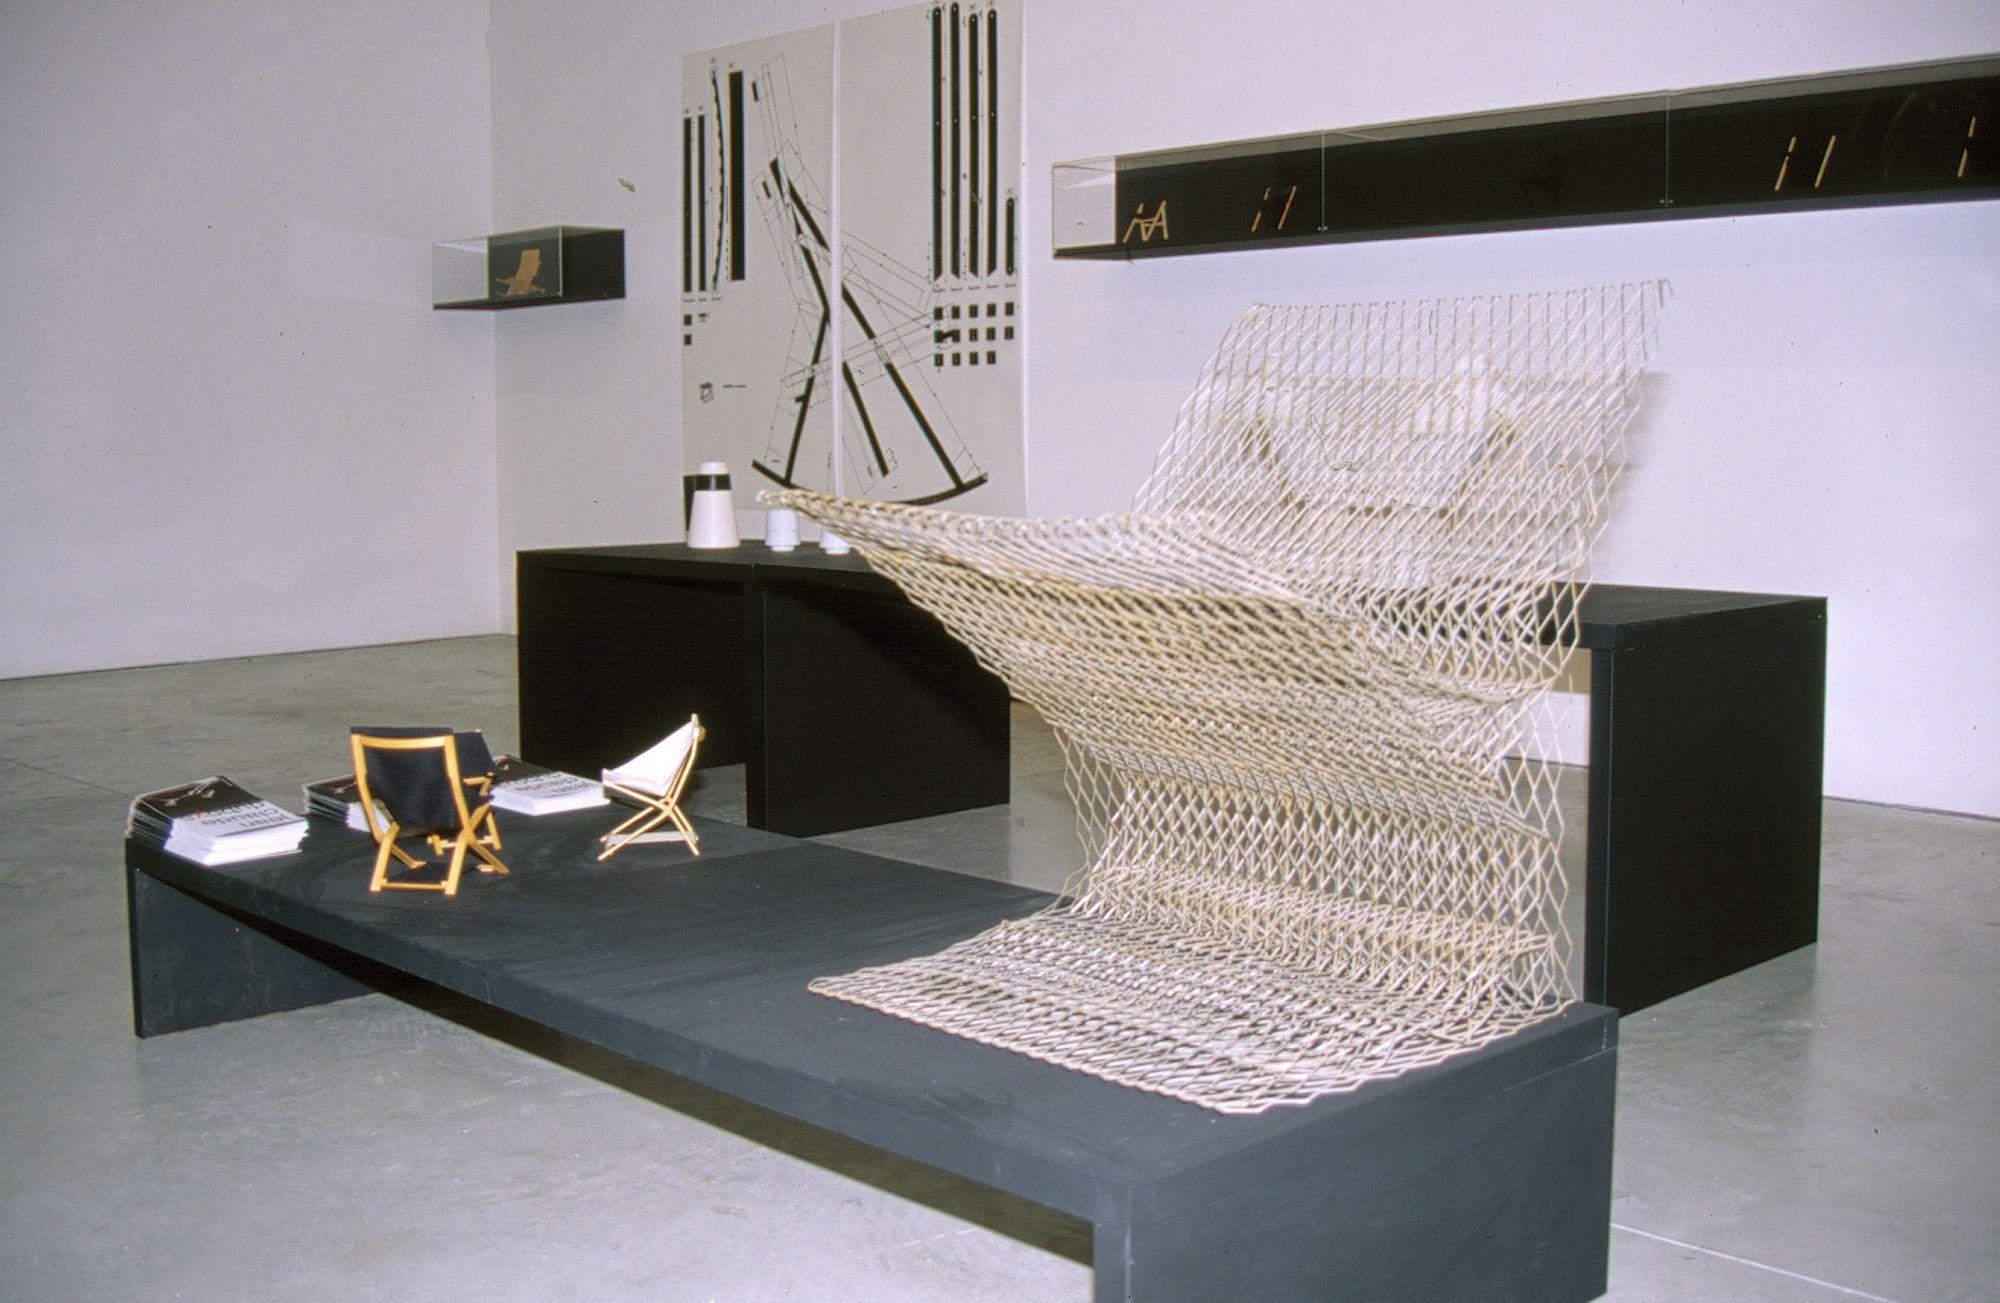 jean claude duboys 1938 1999 rocking chairs en rable mod le a 3 circa 1980 edition d 39 epoque. Black Bedroom Furniture Sets. Home Design Ideas